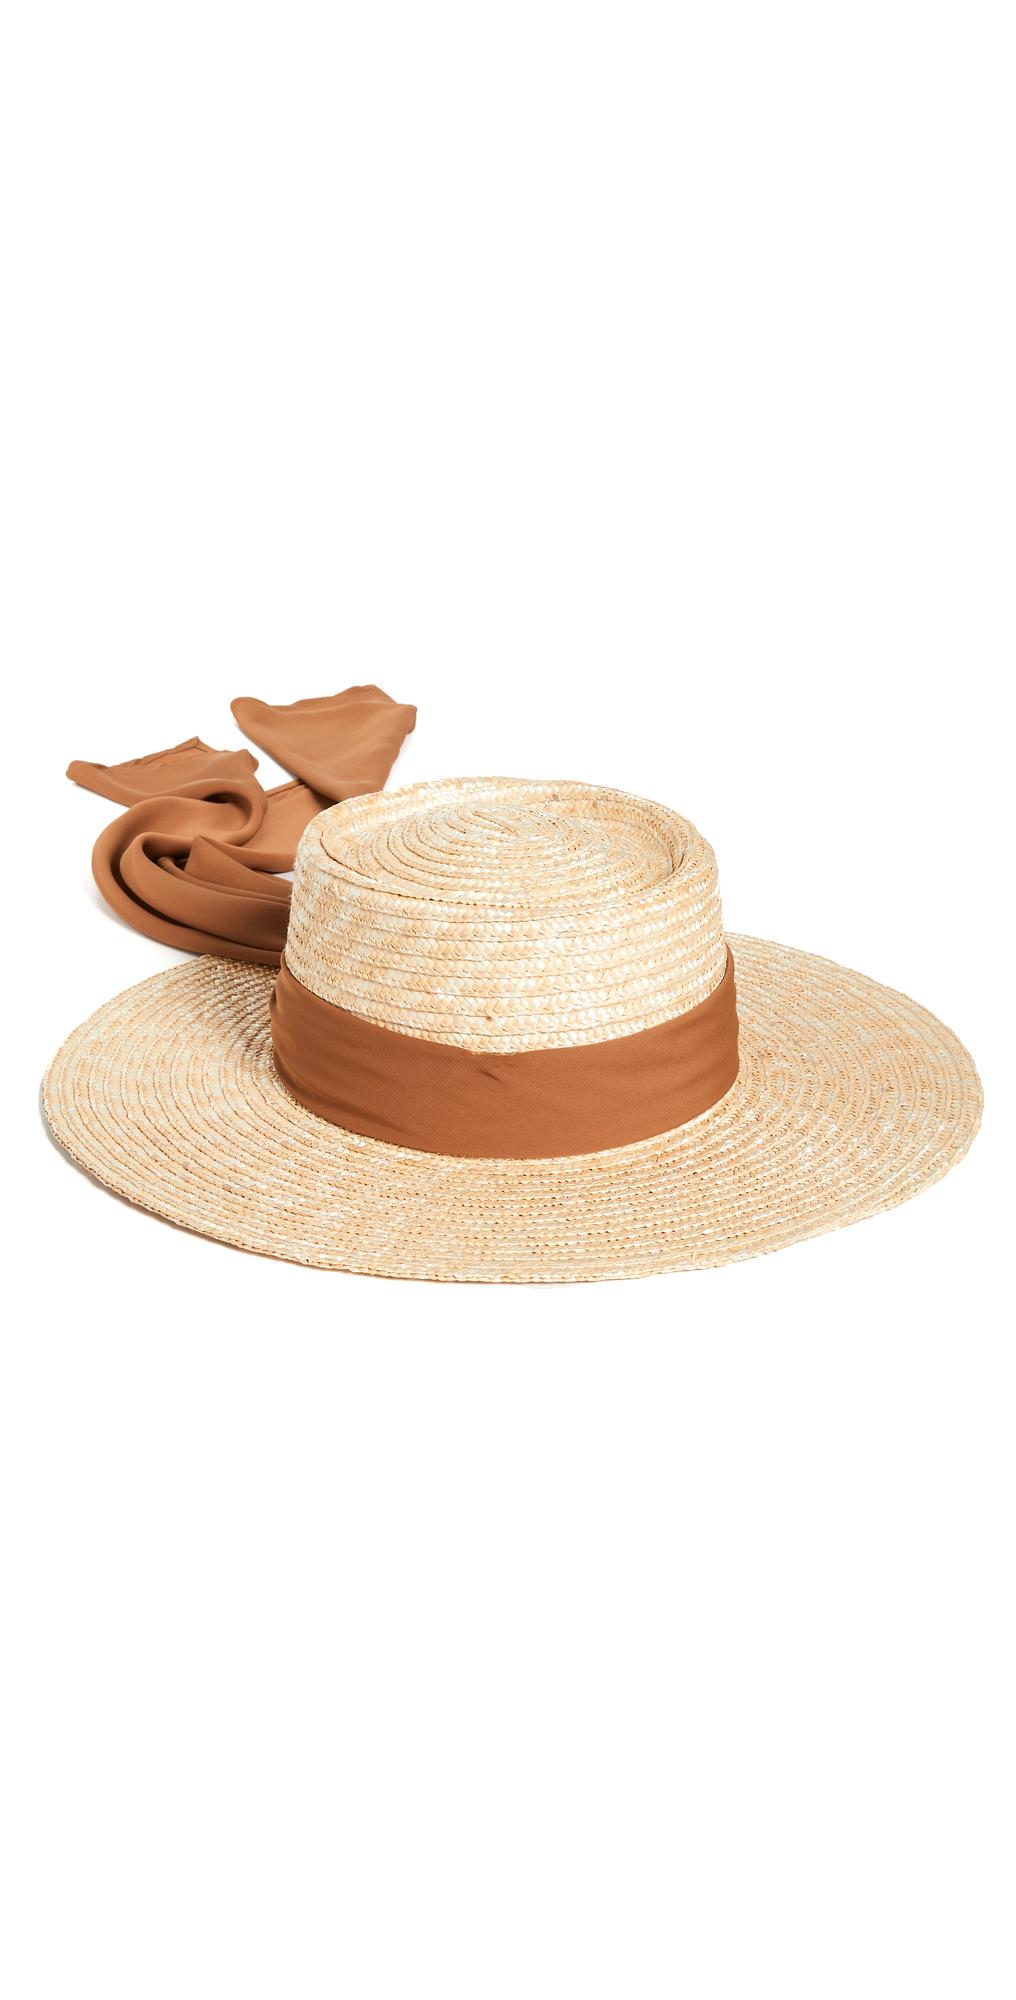 Aries Sun Hat